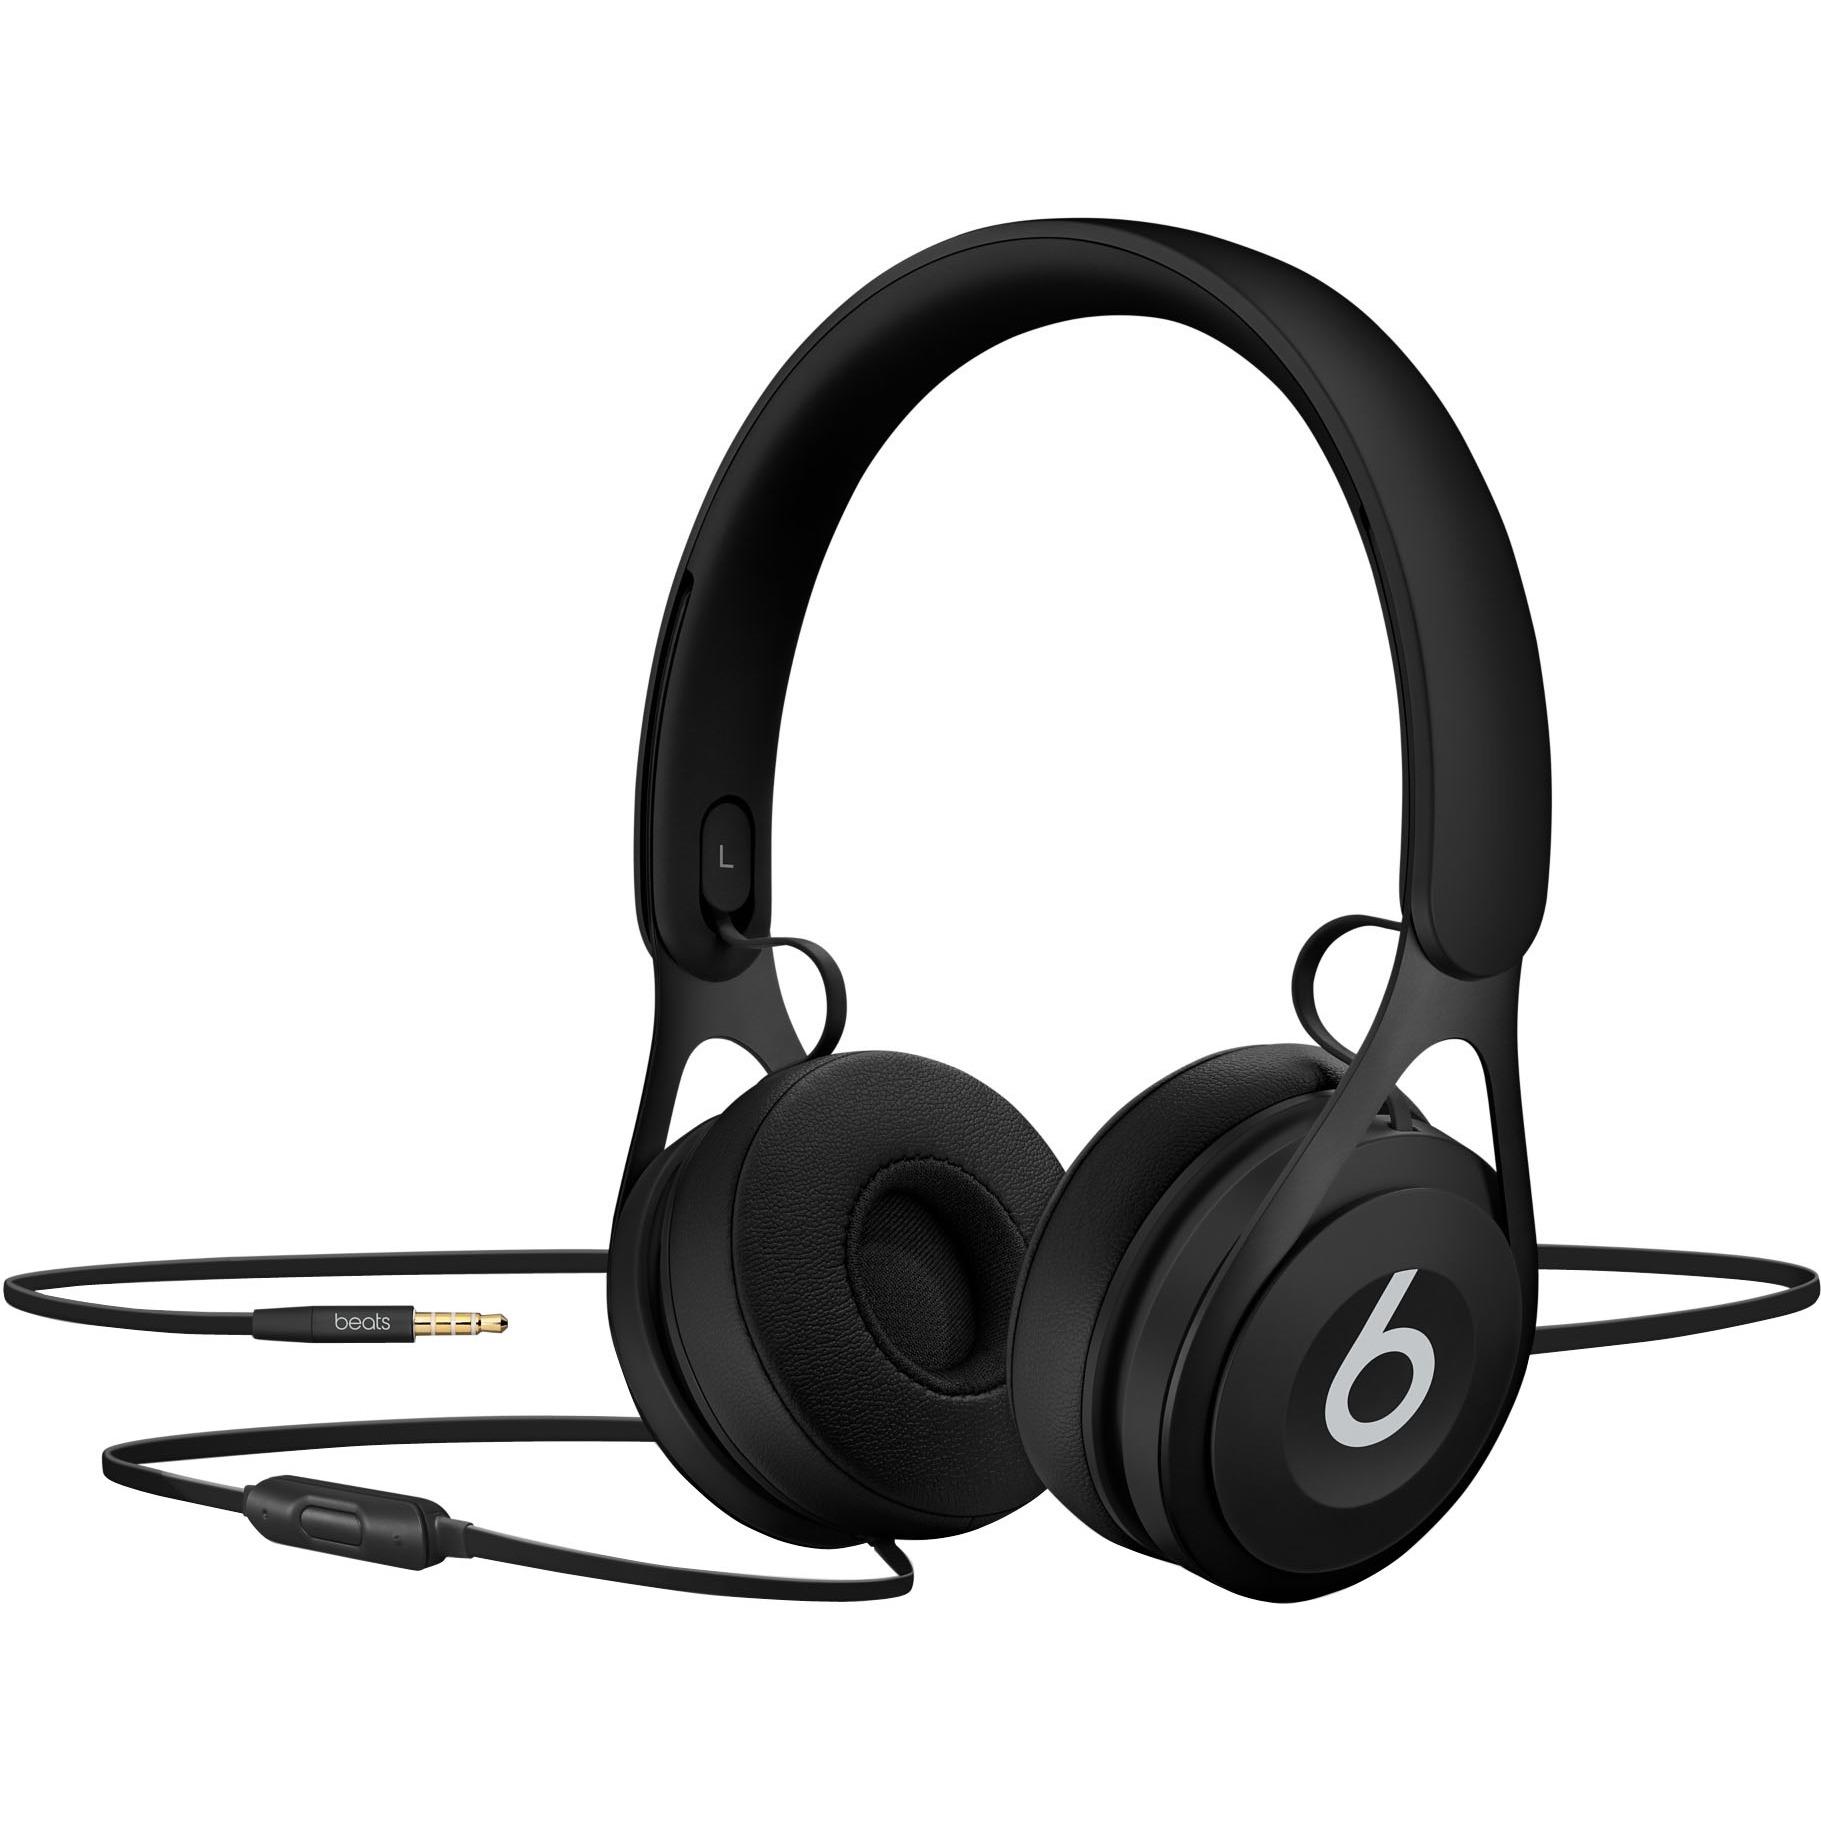 Beats by Dr. Dre EP On-Ear Headphones - Black - Stereo - Black - Mini-phone - Wired - Over-the-head - Binaural - Supra-aural 0